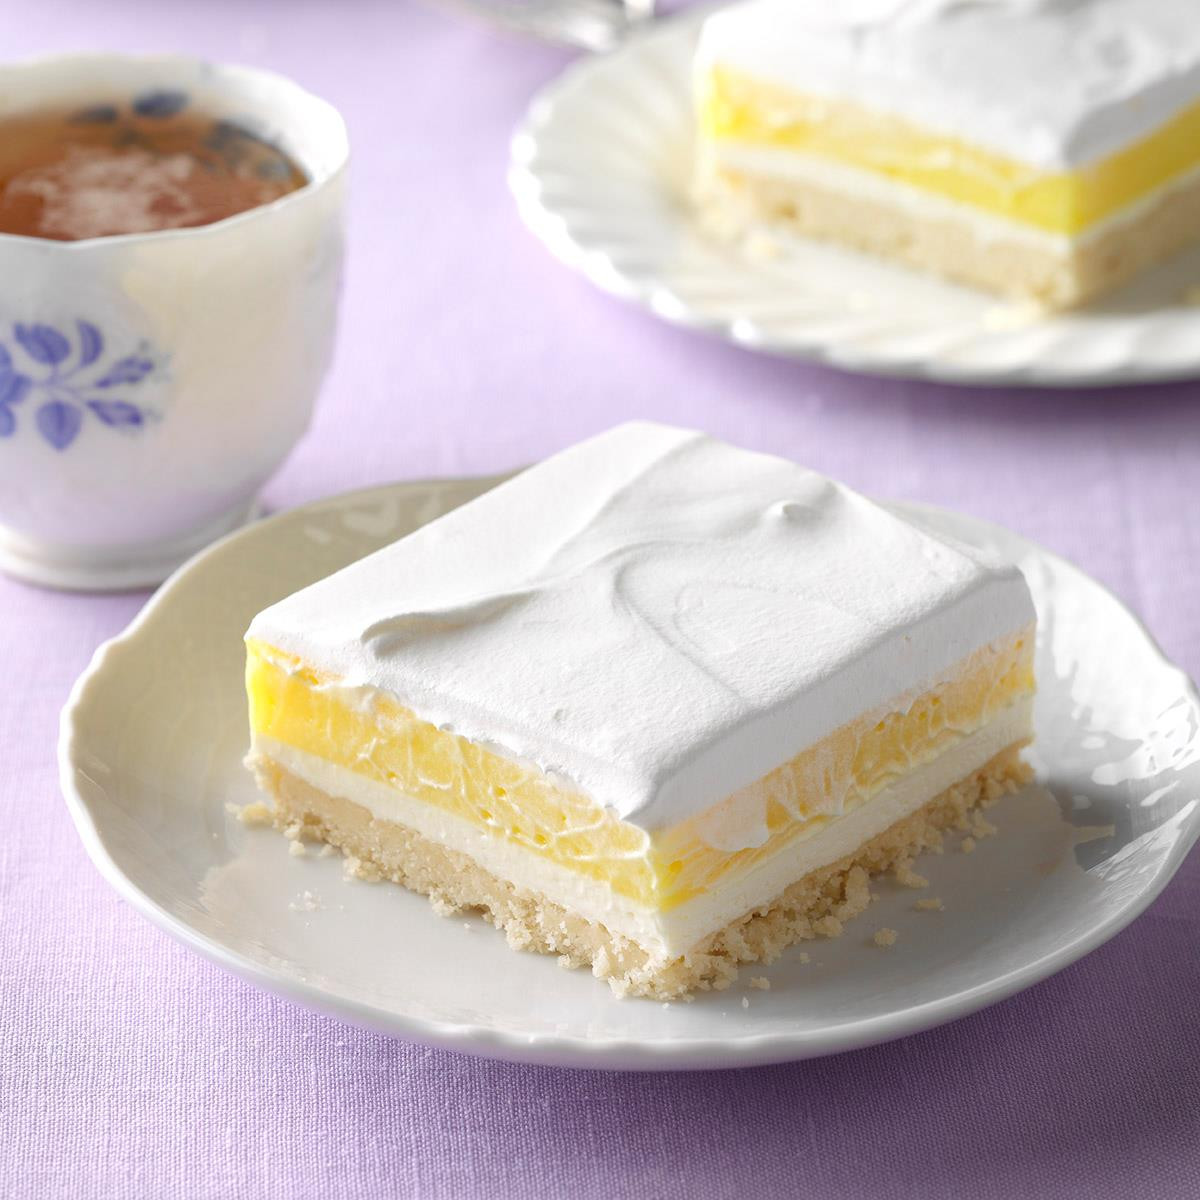 Lemon Pudding Dessert  Lemon Pudding Dessert Recipe